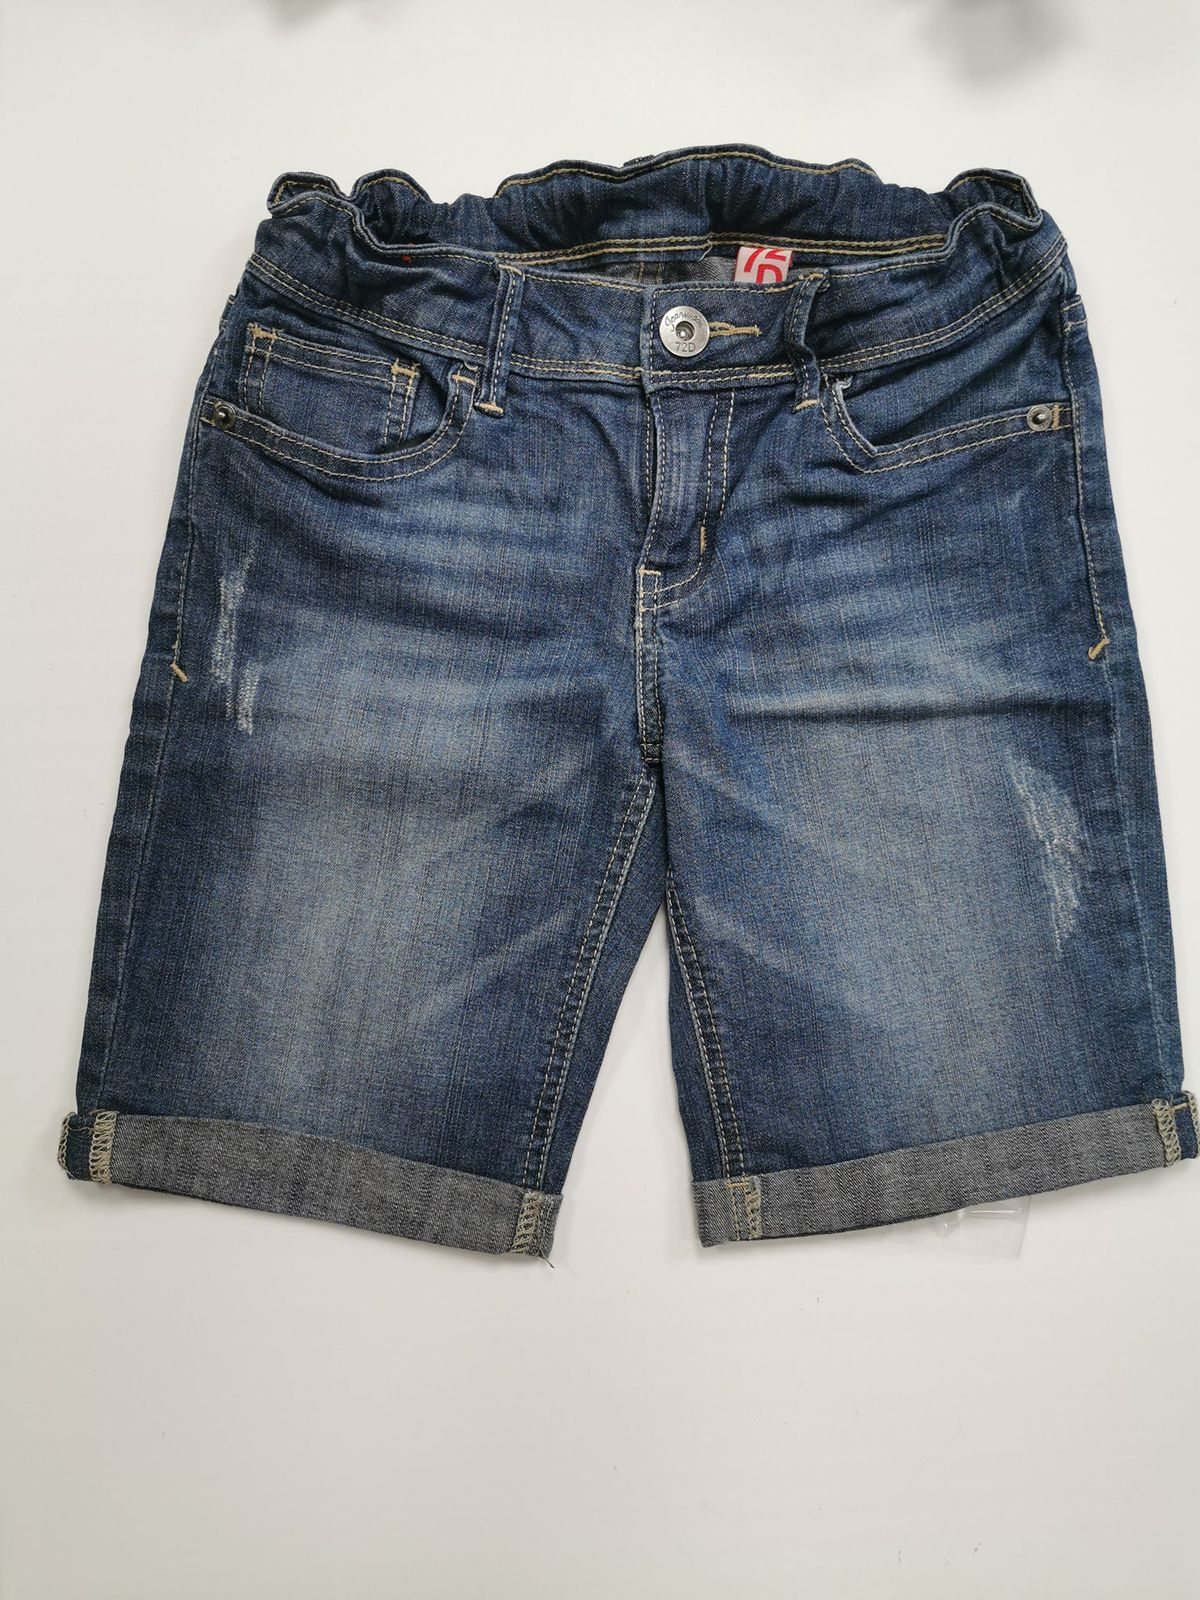 13276. Pantaloni corti 10/11 anni Euro 7,50